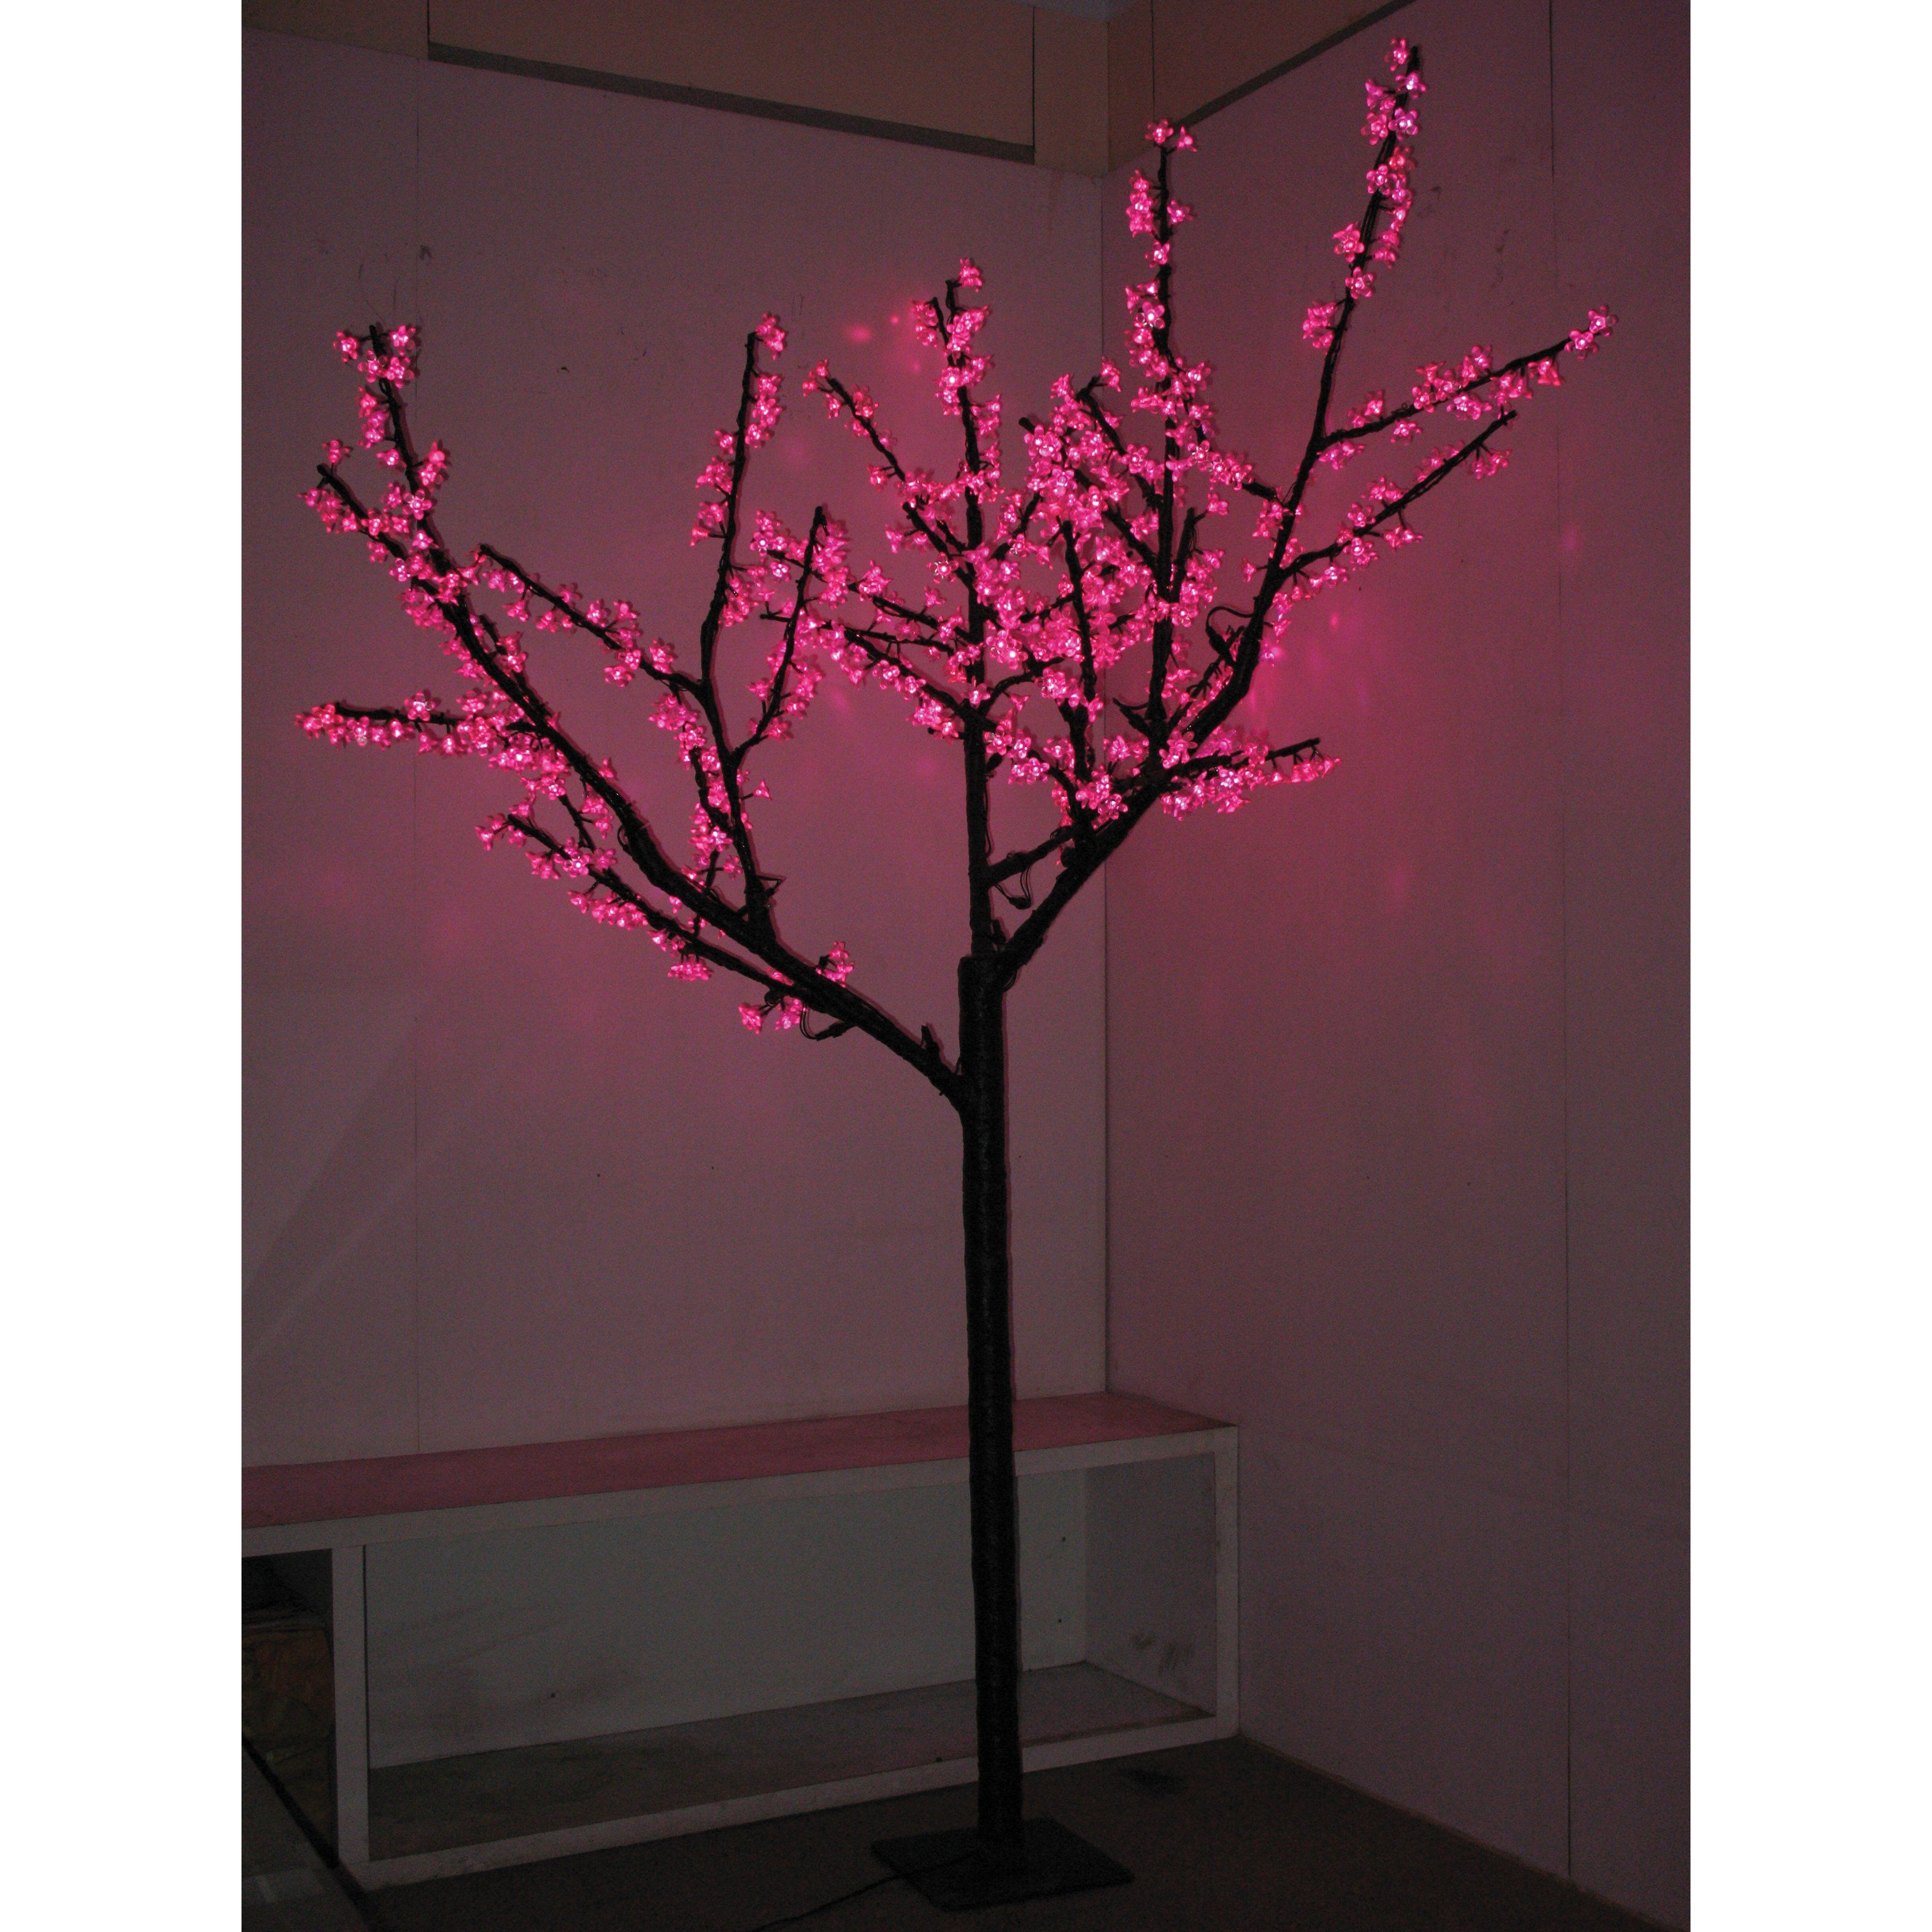 8 Ft Pre Lit Led Cherry Blossom Tree Pink 629 99 Cherry Blossom Bedroom Contemporary Holiday Decor Cherry Blossom Tree